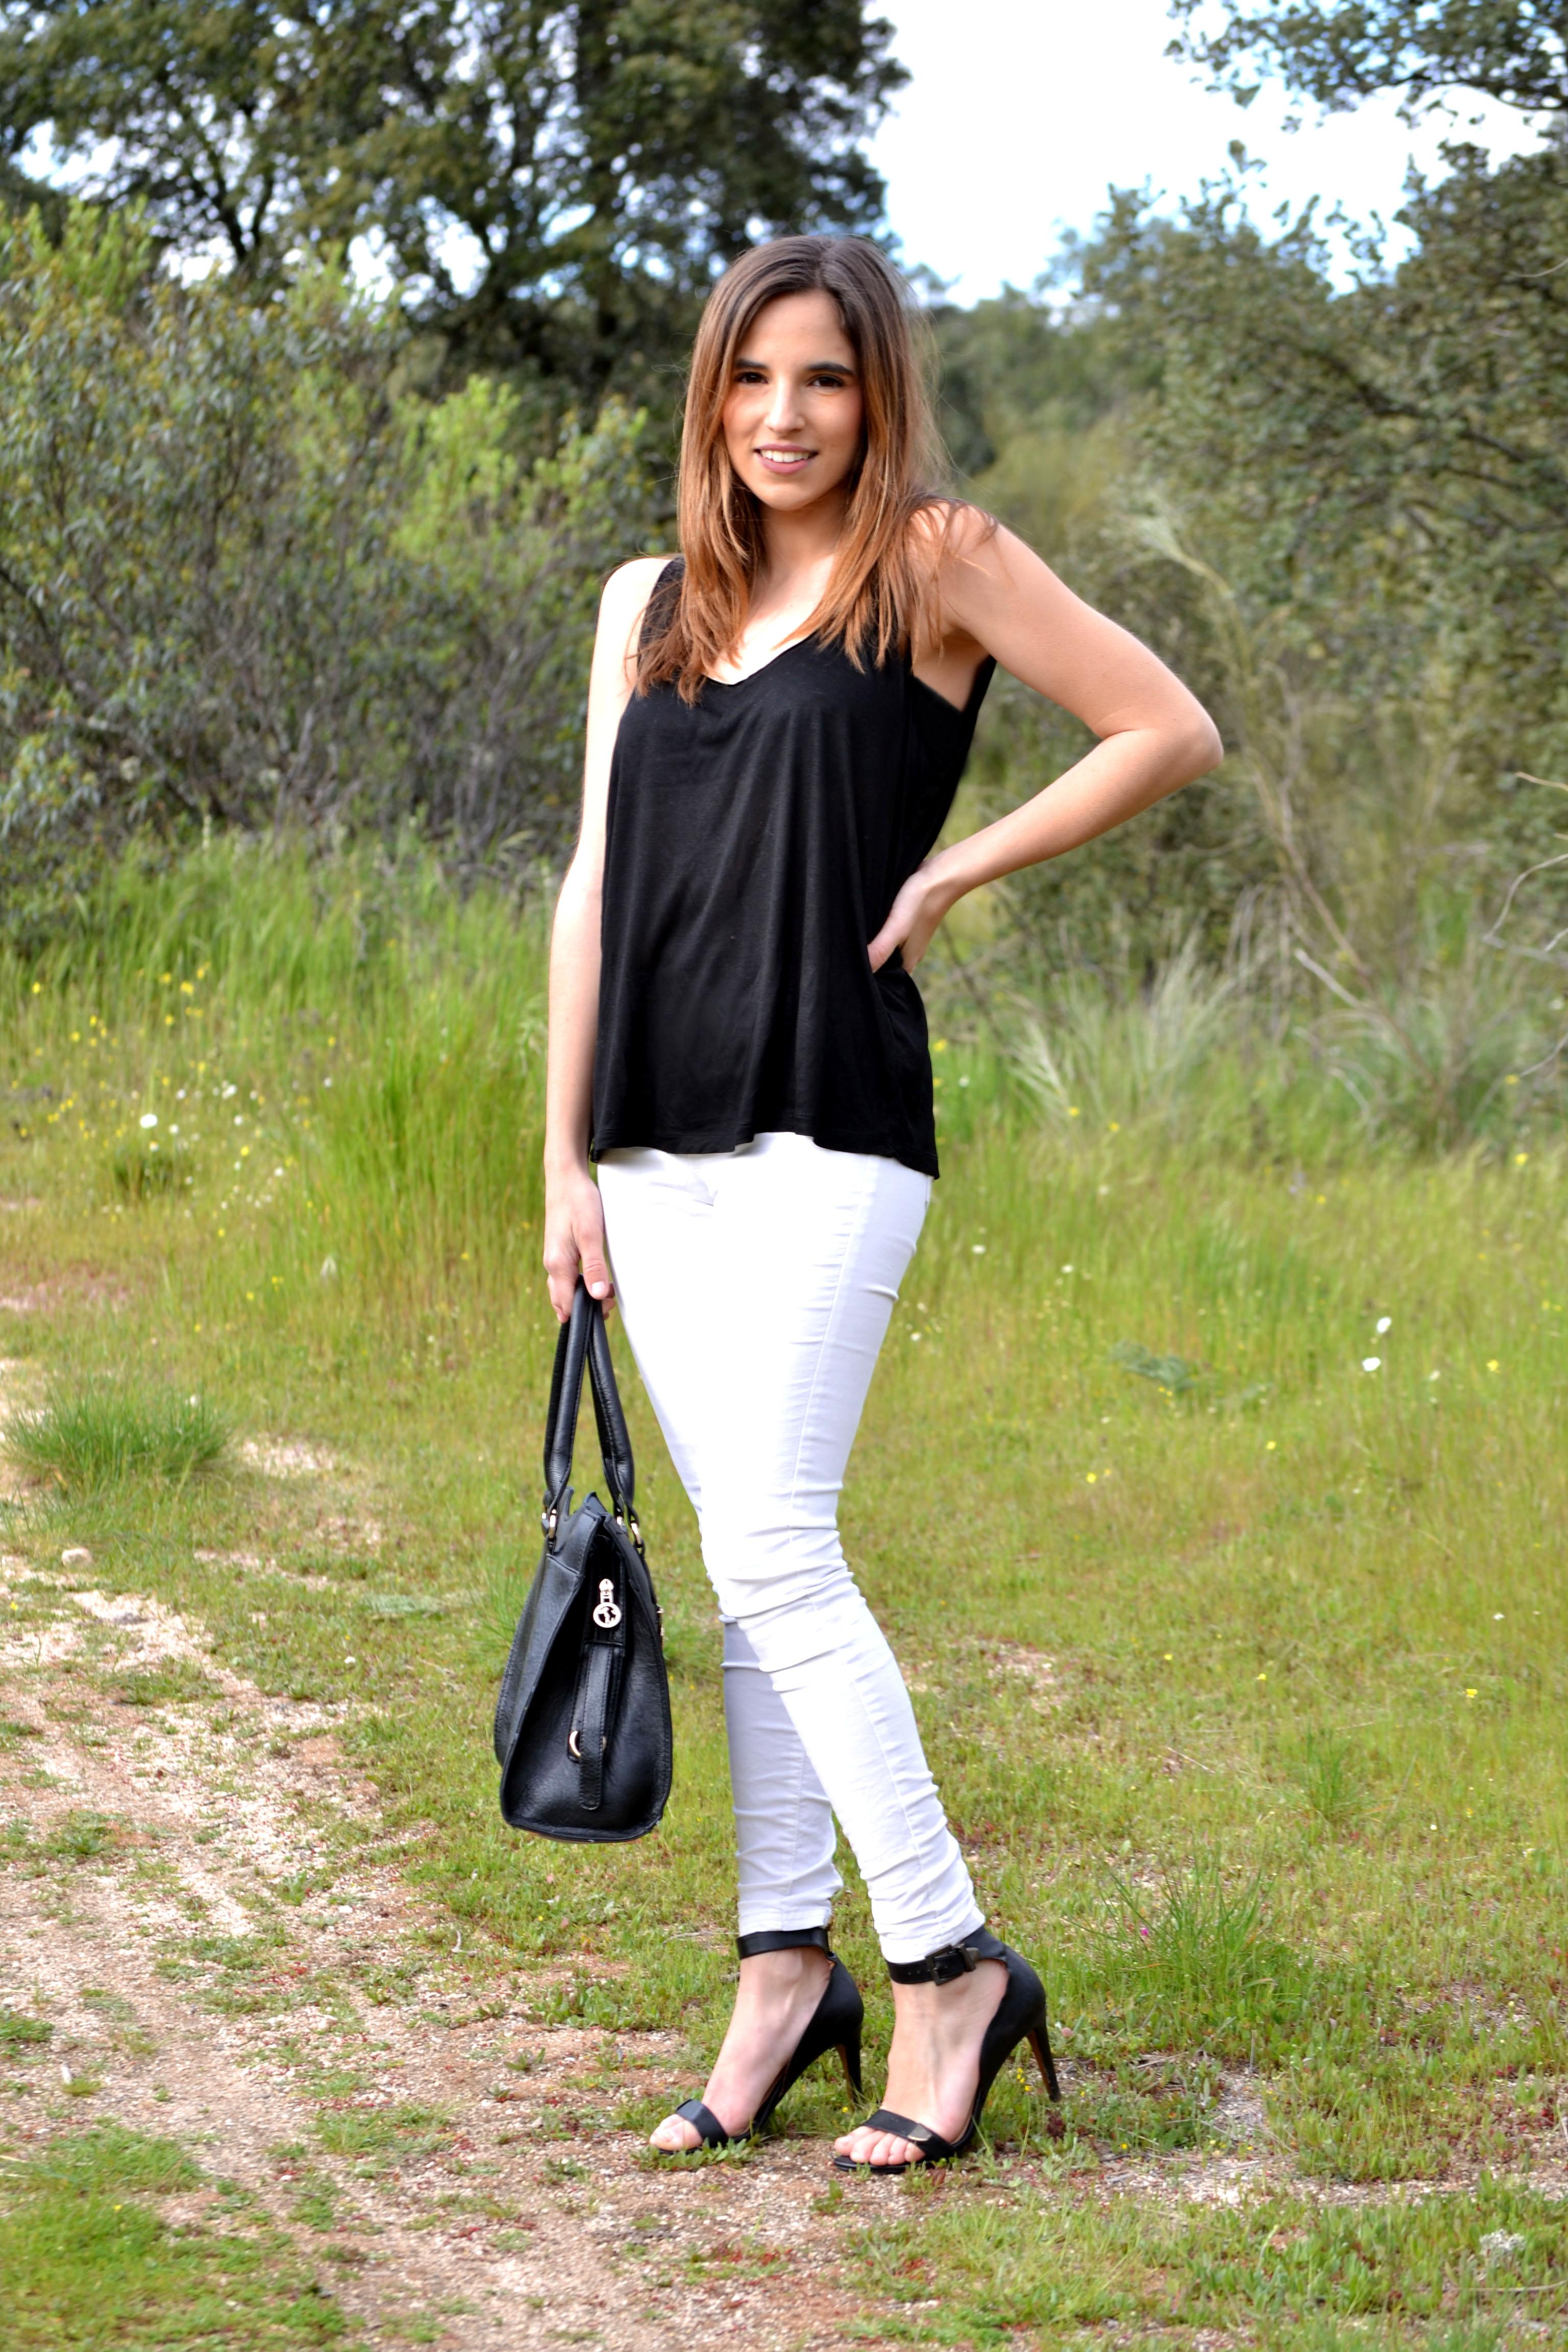 523326e9c8293 ... la reina del low cost blog moda barata style outfitt camiseta basica  h m negra pantalones bershka